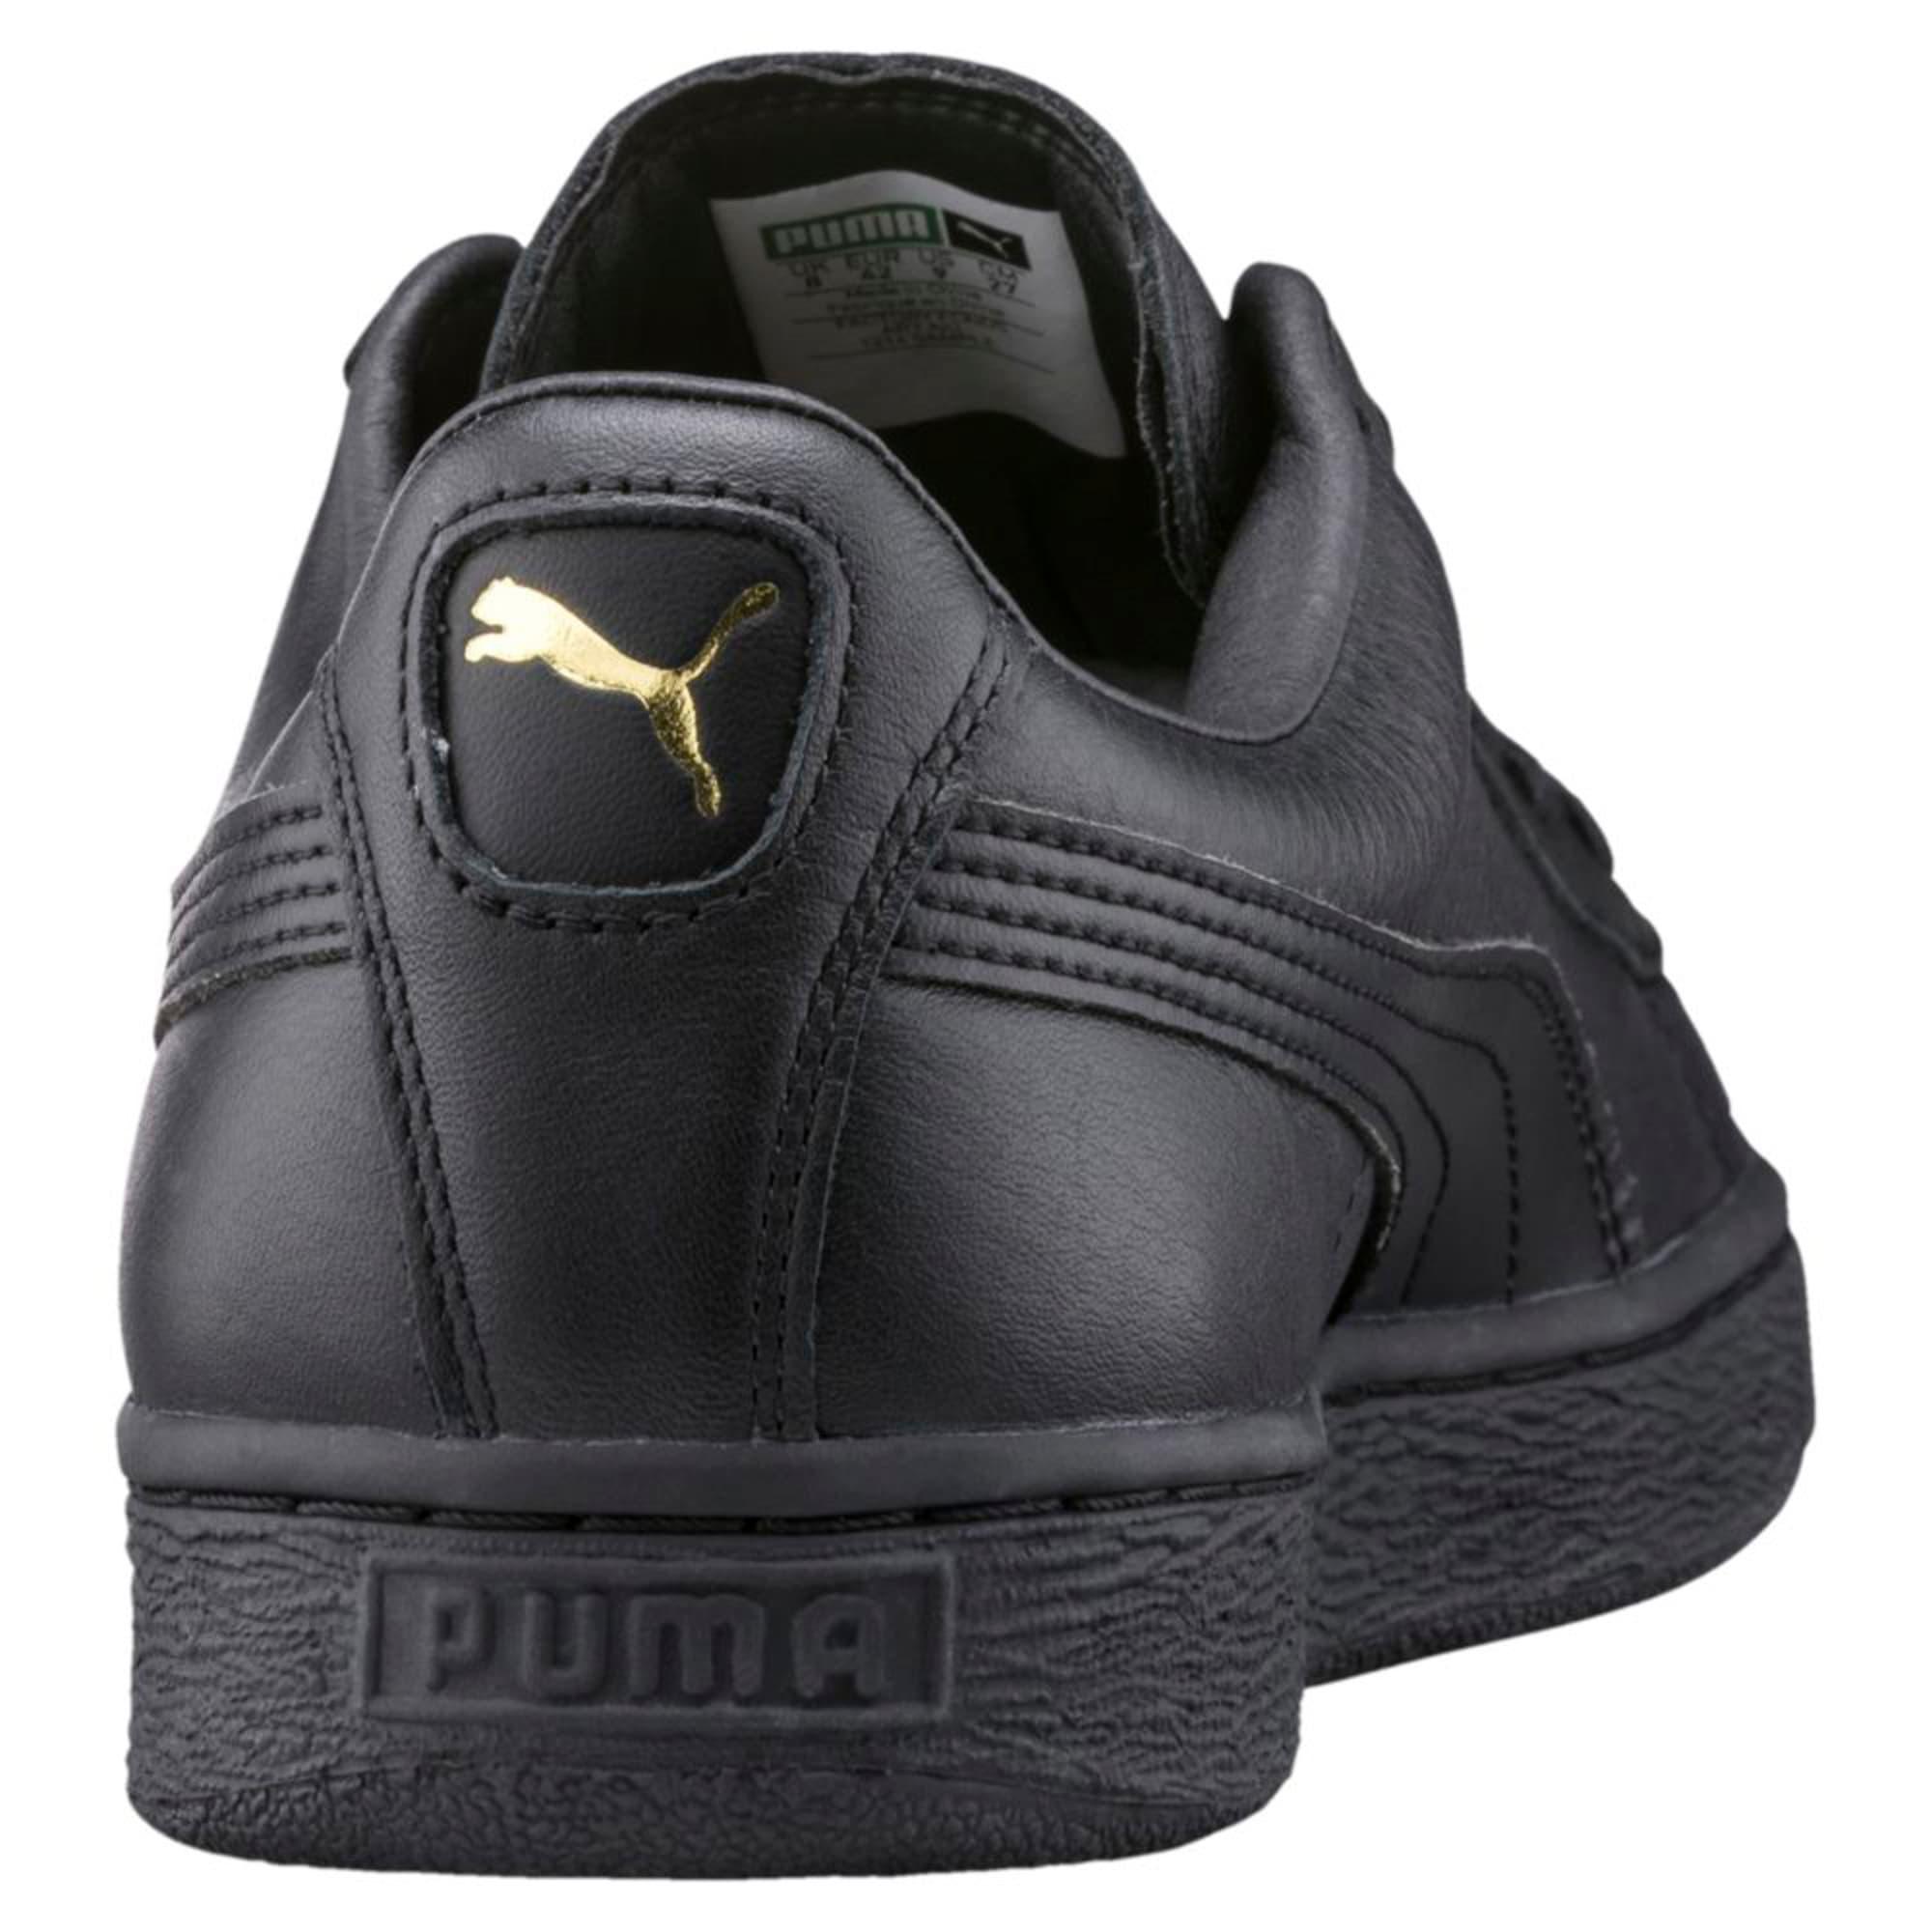 Thumbnail 4 of Basket Classic LFS Men's Shoes, black-team gold, medium-IND